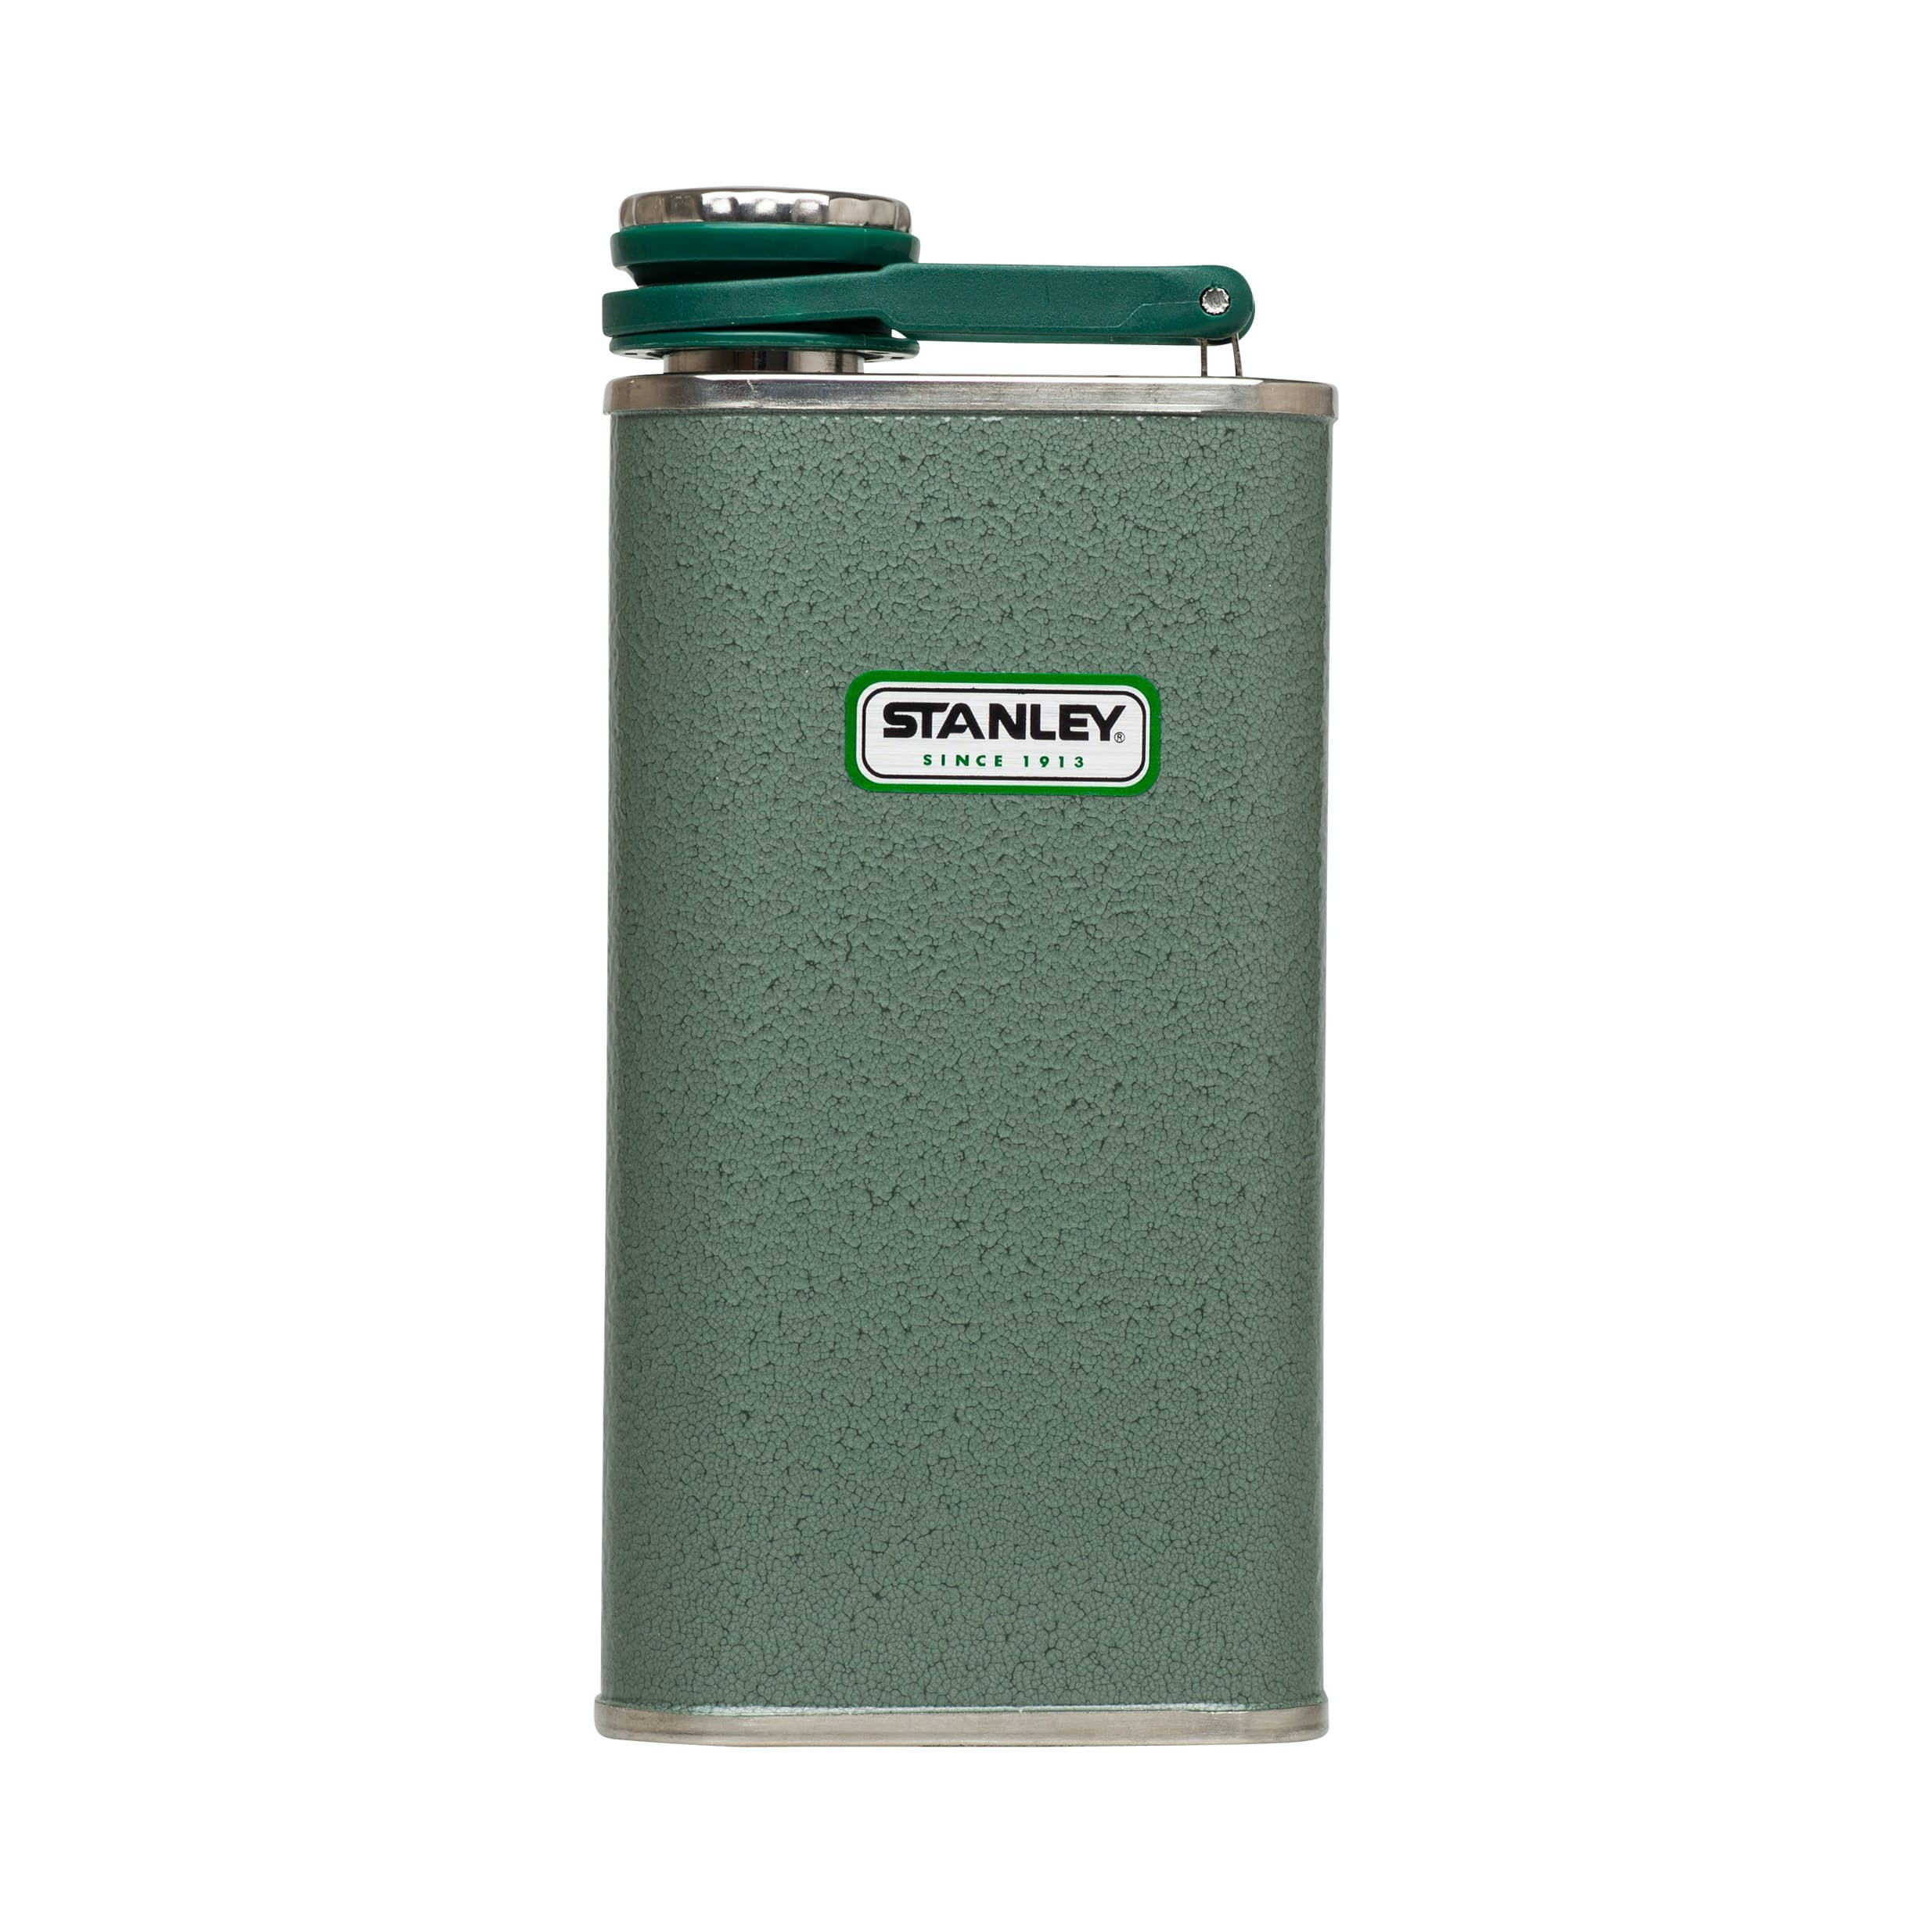 A9bouoxbfo stanley classic flask 0 original